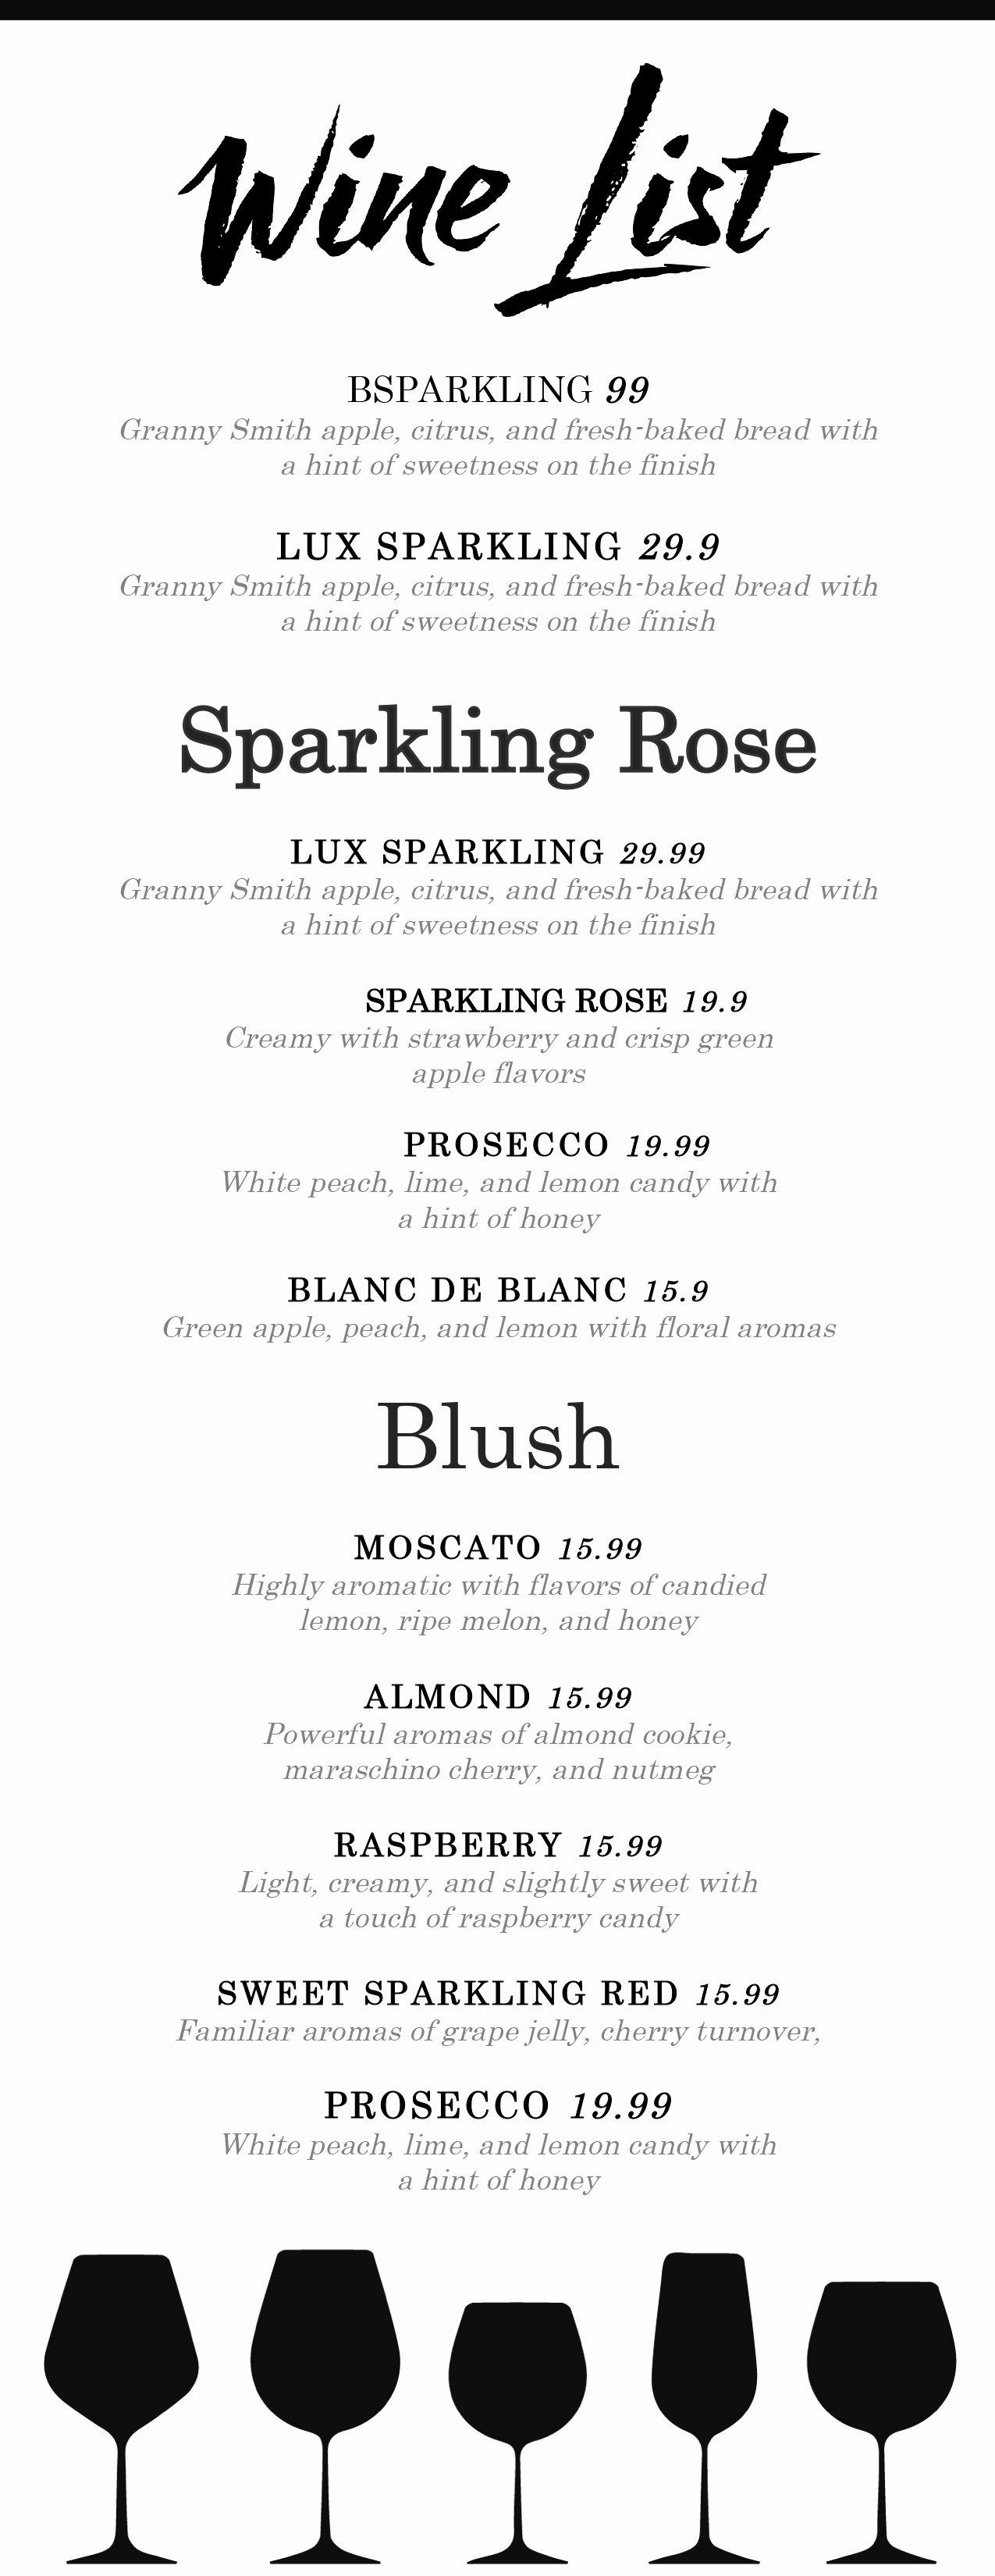 Restaurant Menu Template Word Best Of Design & Templates Menu Templates Wedding Menu Food